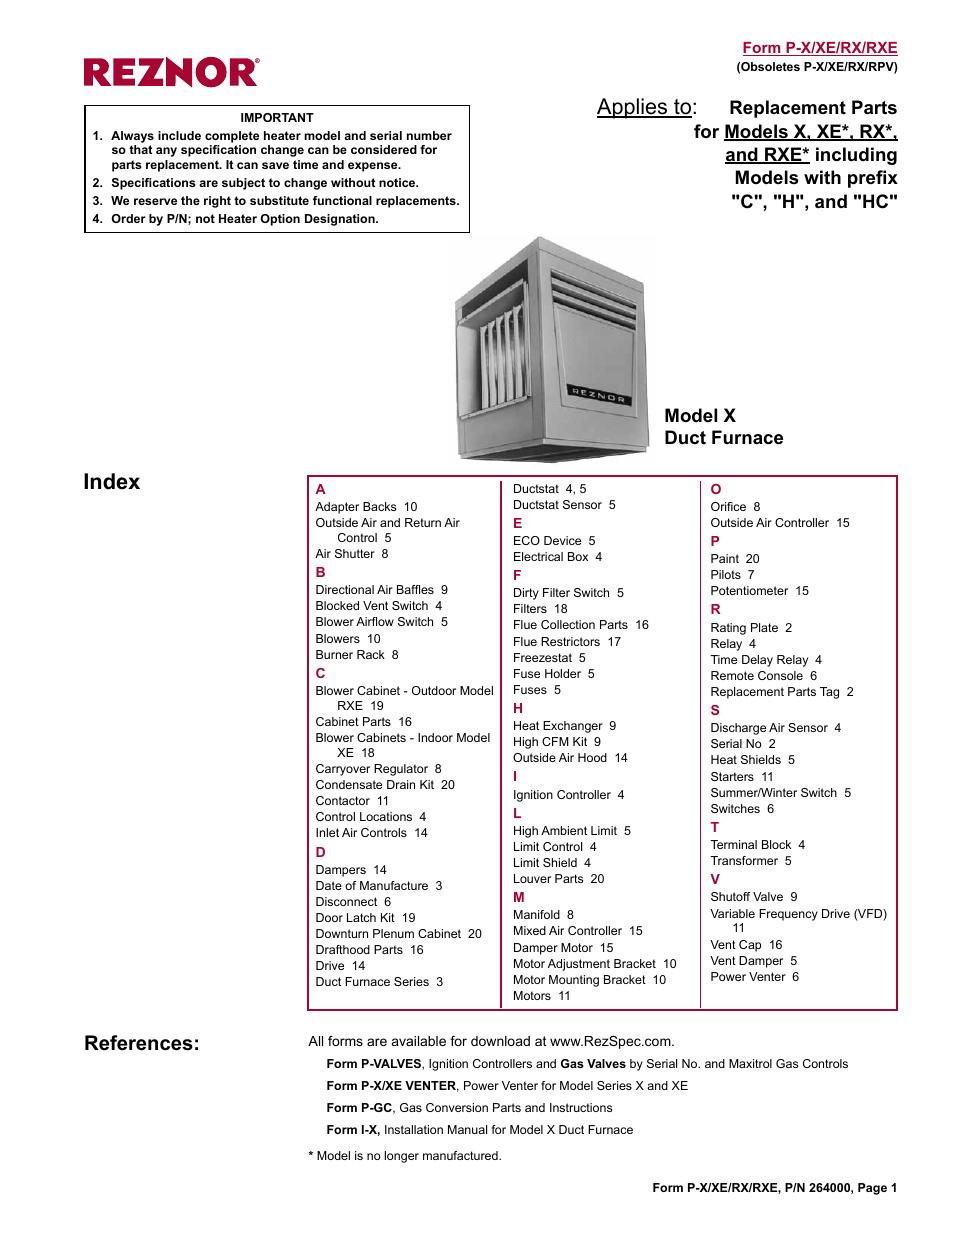 Reznor Rxe Parts Manuals User Manual